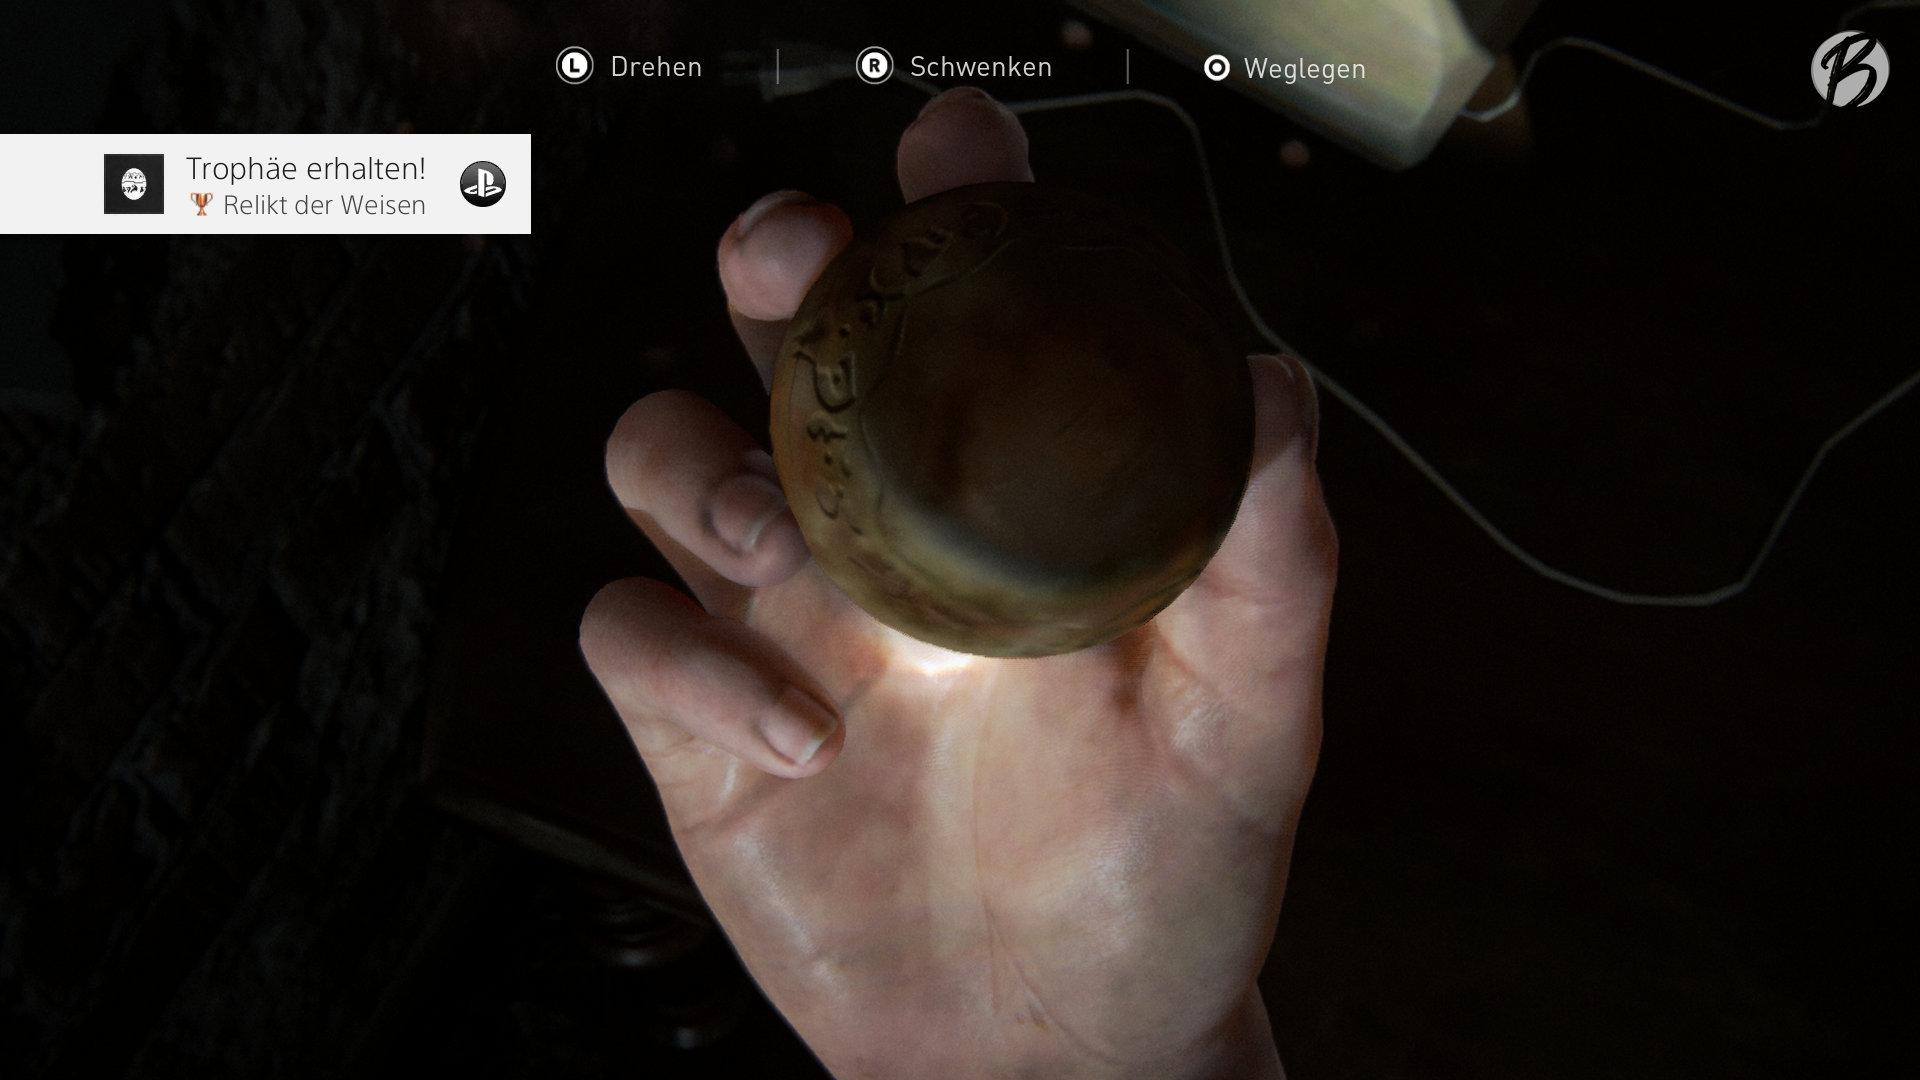 The Last of Us Part II - Trophäe: Relikt der Weisen - Jak and Daxter Precursor Orb